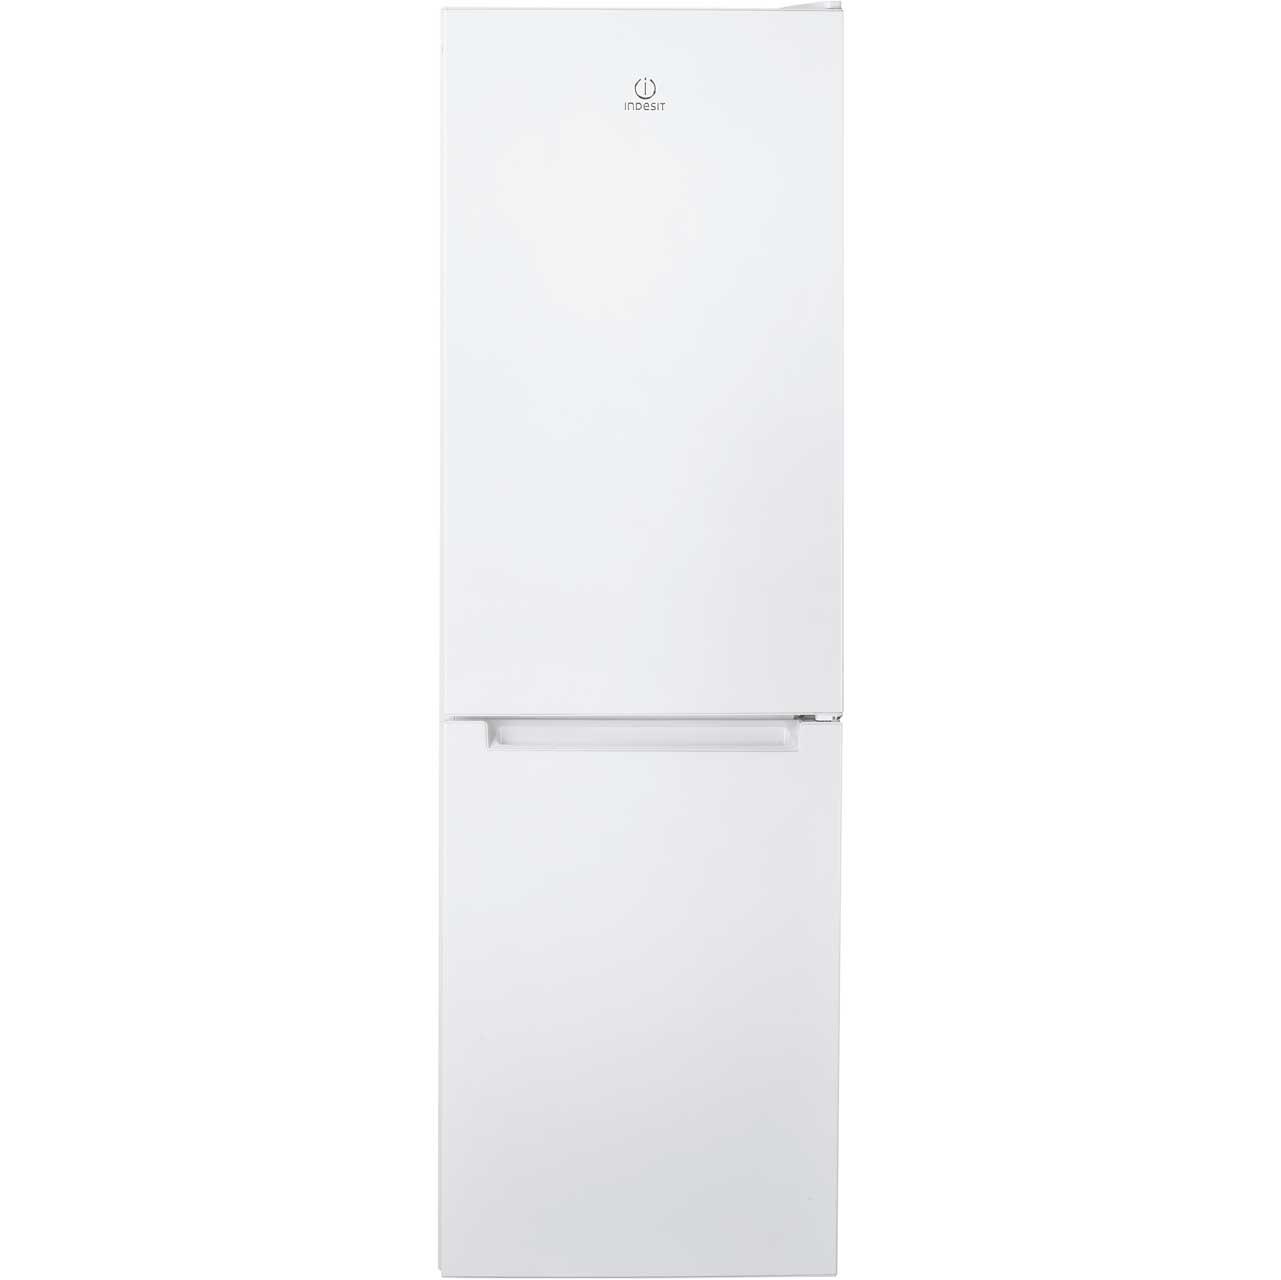 INDESIT  LR8 S1 W UK Fridge Freezer - White, White